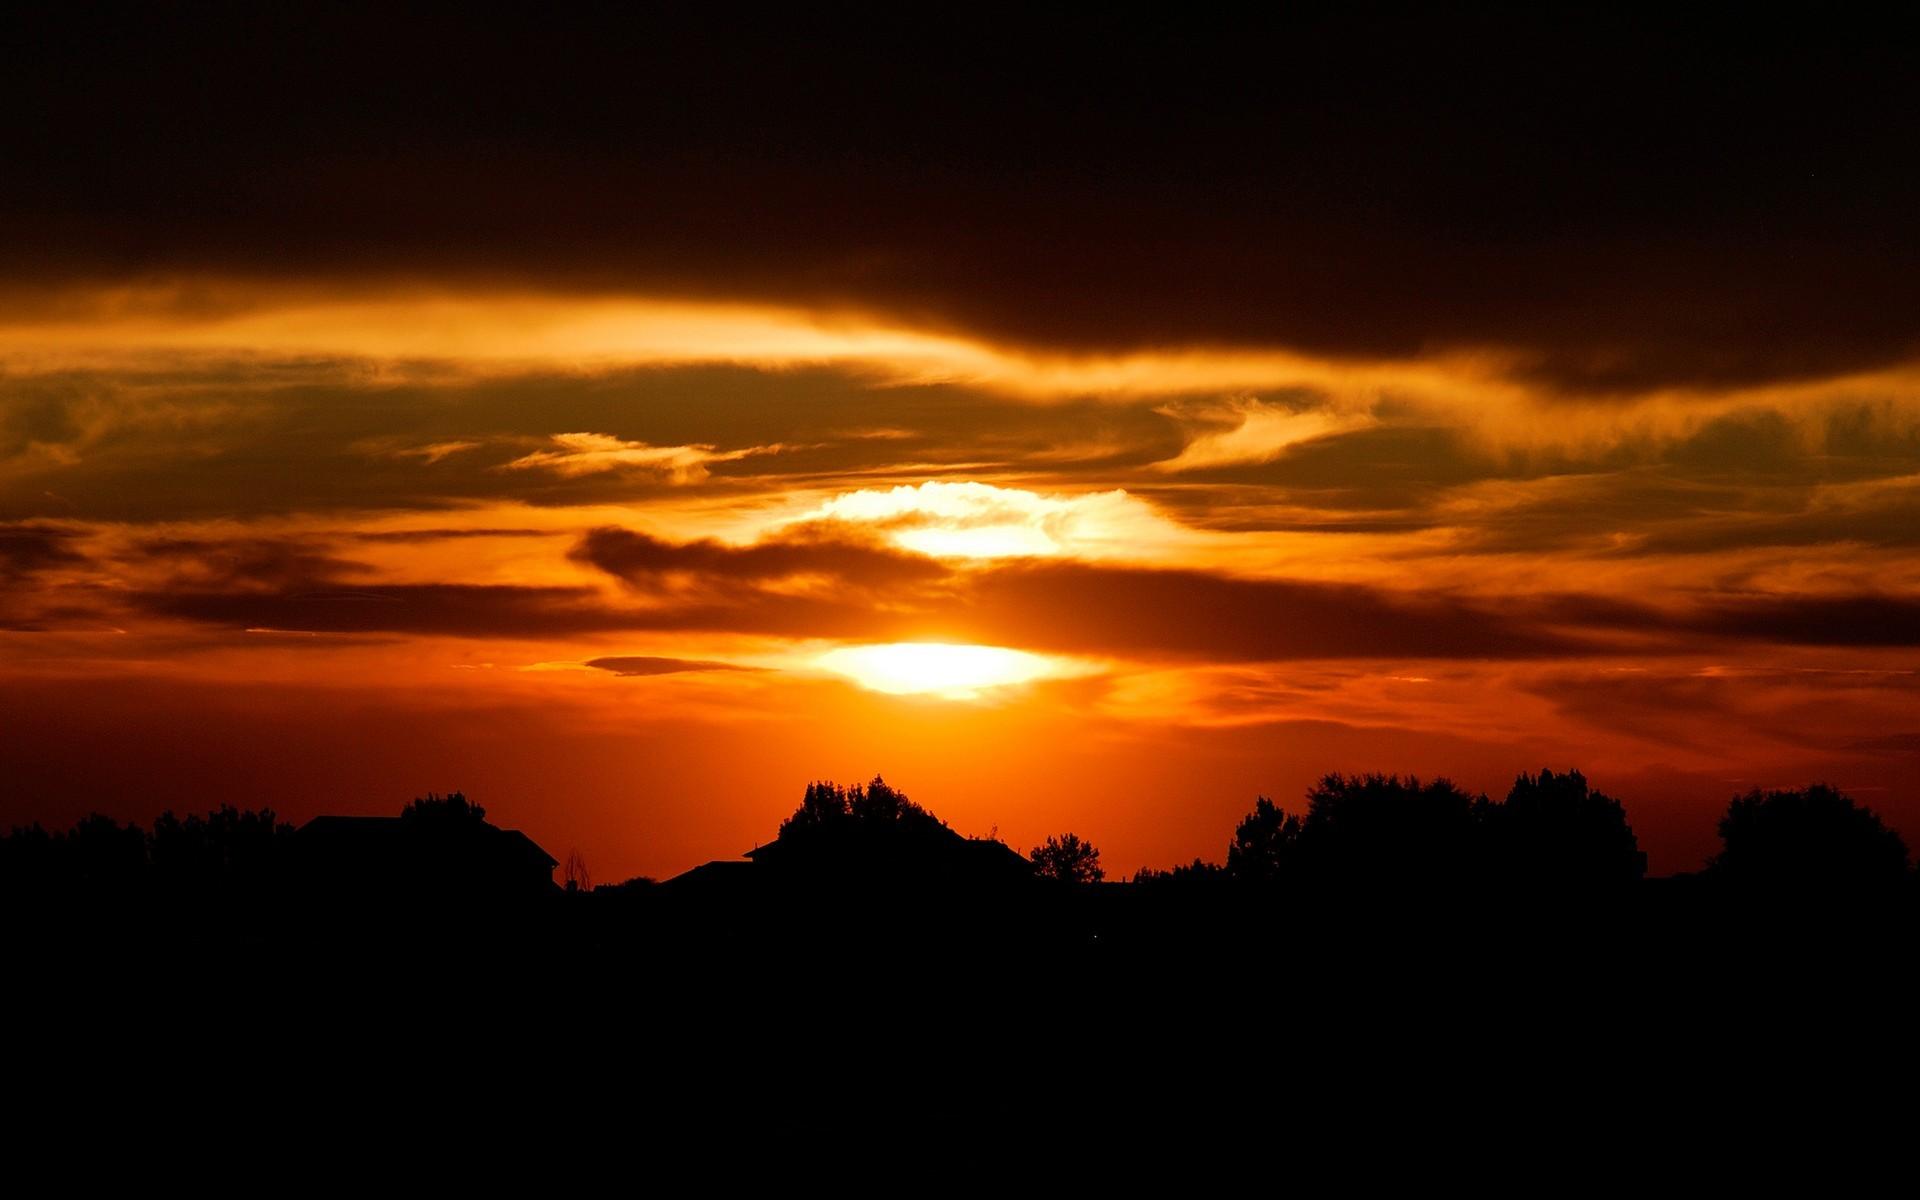 The star of evening / 1920 x 1200 / Sunriseandsunset / Photography ...